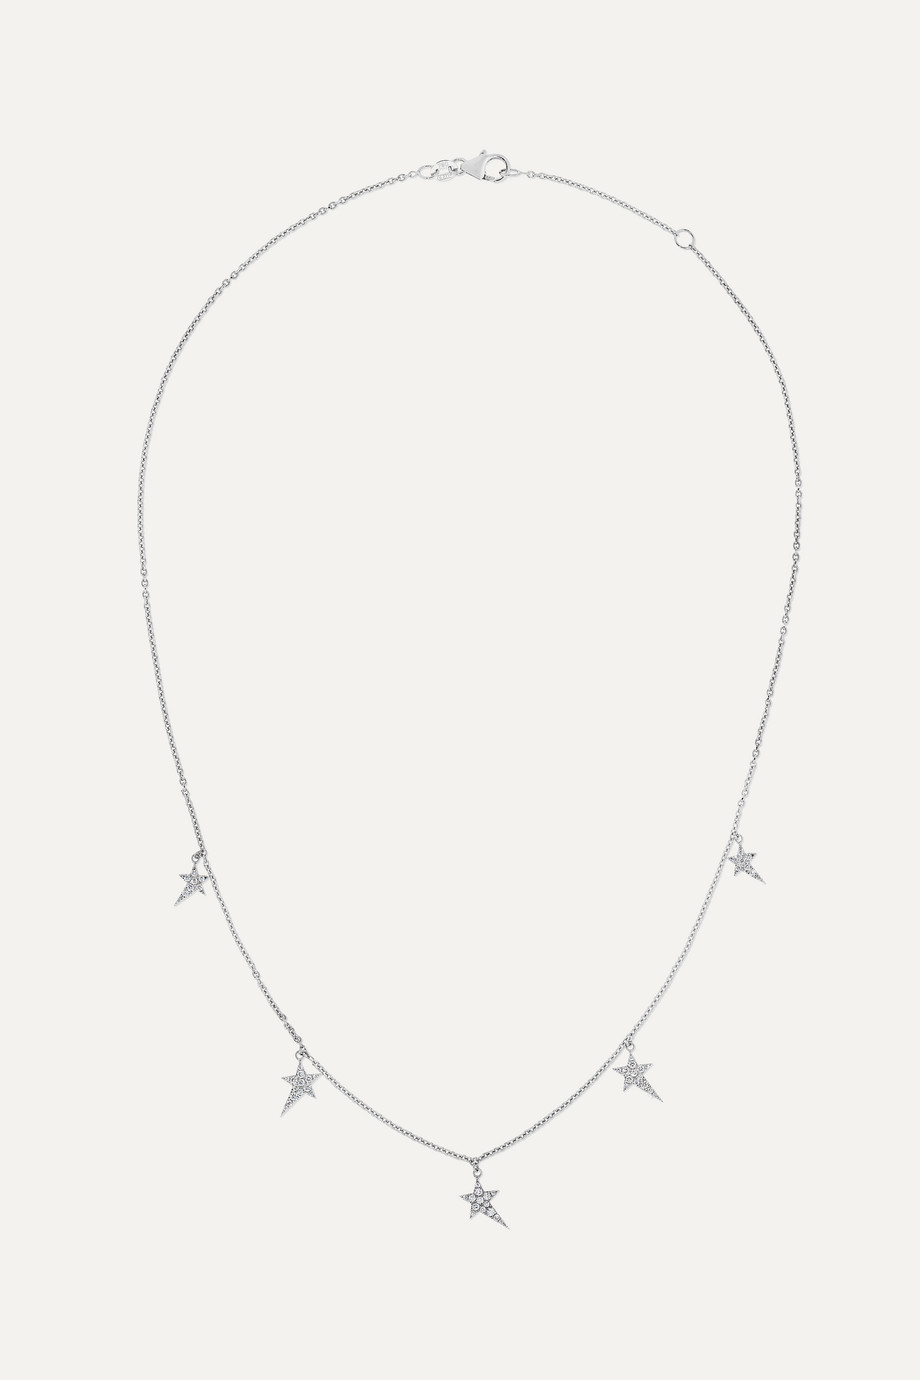 Diane Kordas 5 Star 18-karat white gold diamond necklace